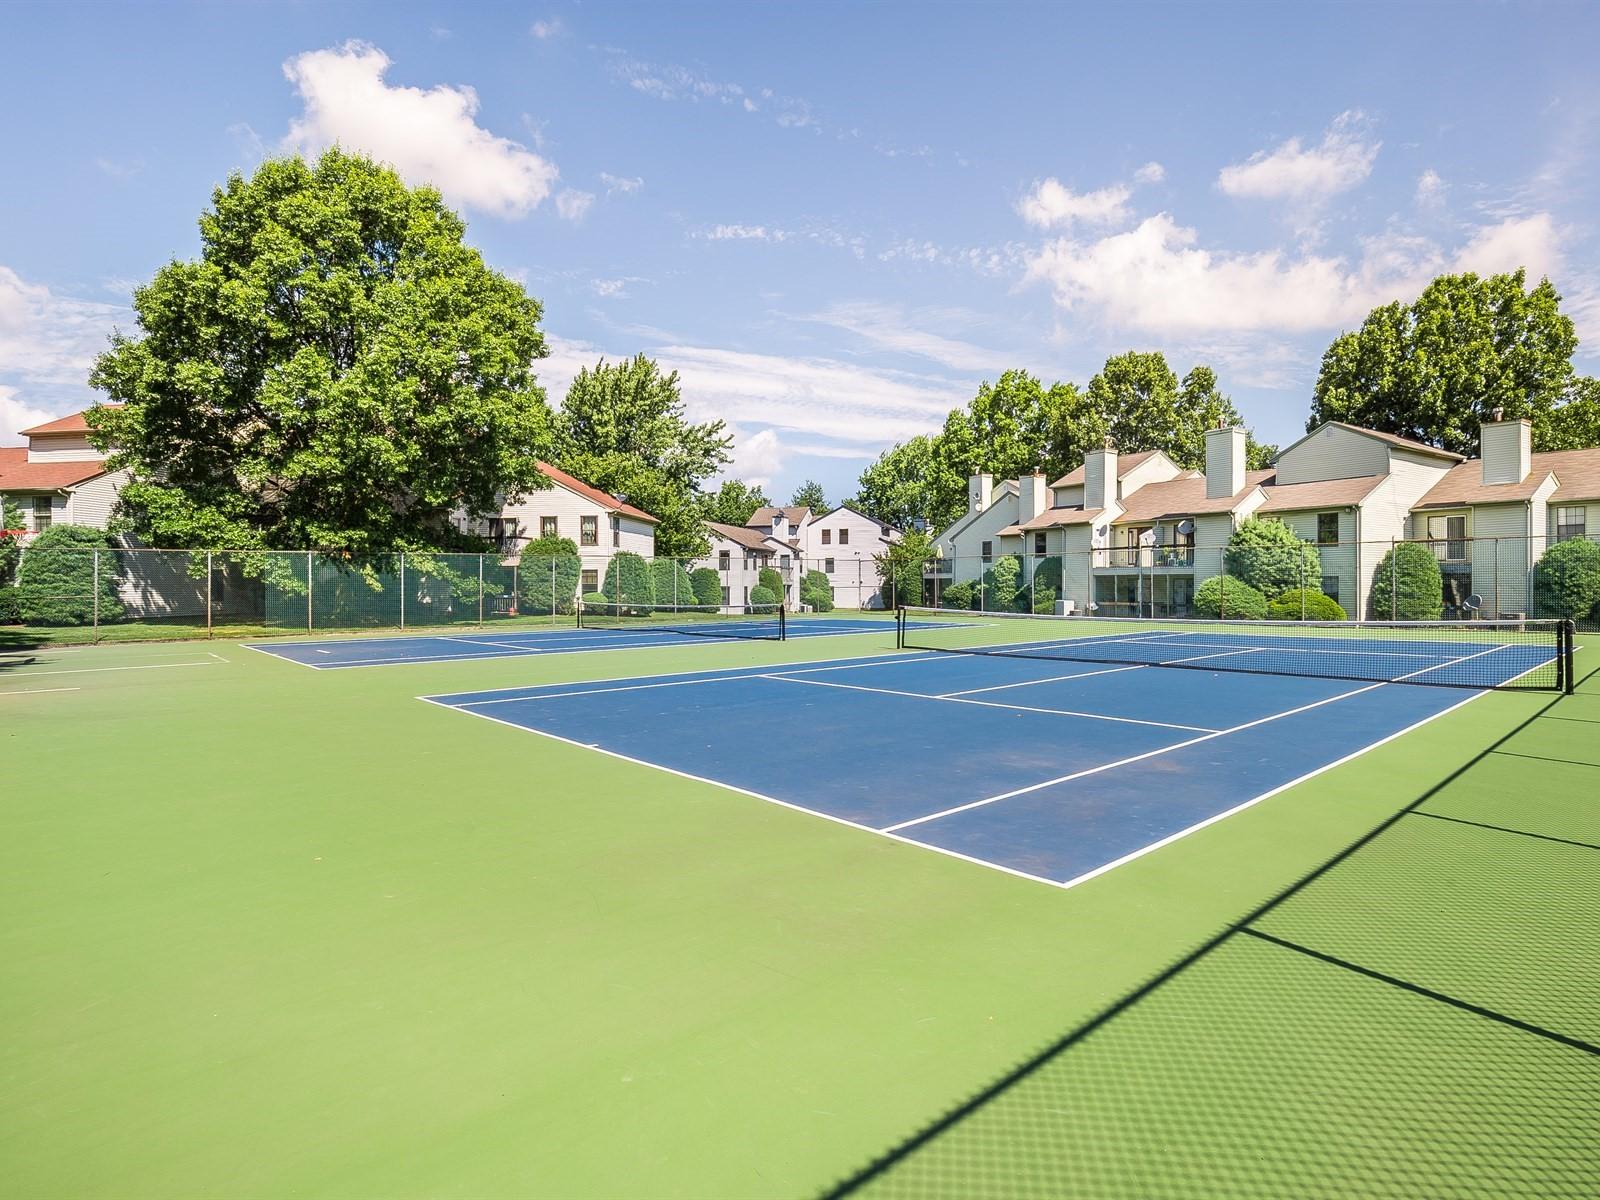 Woodbridge 4 Temporary Housing complex tennis court